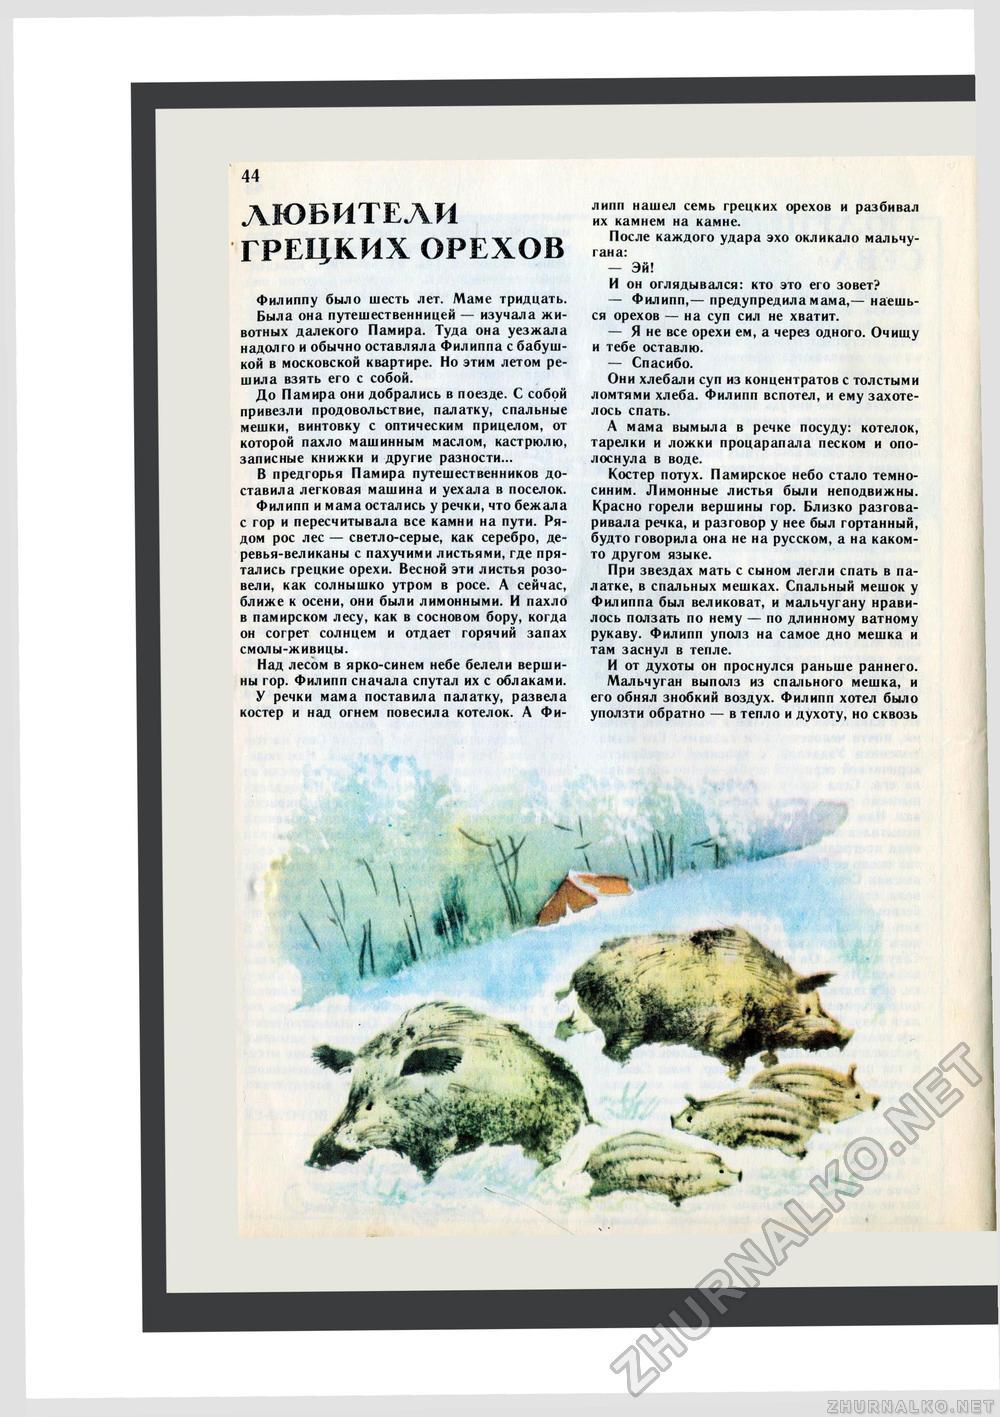 1982 натуралист любитель